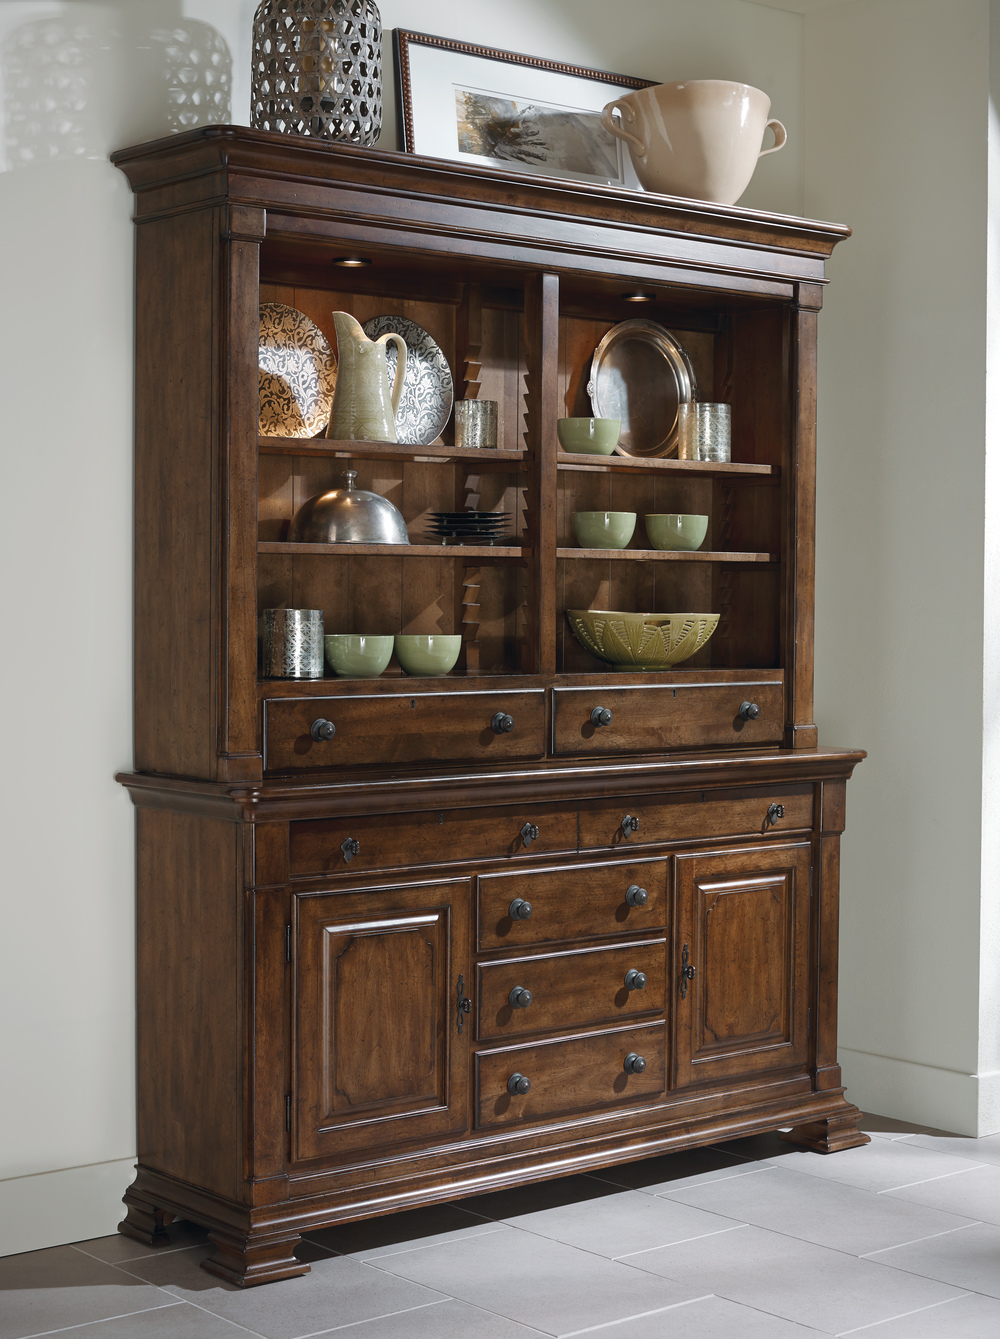 Kincaid Furniture - China Hutch w/ Base